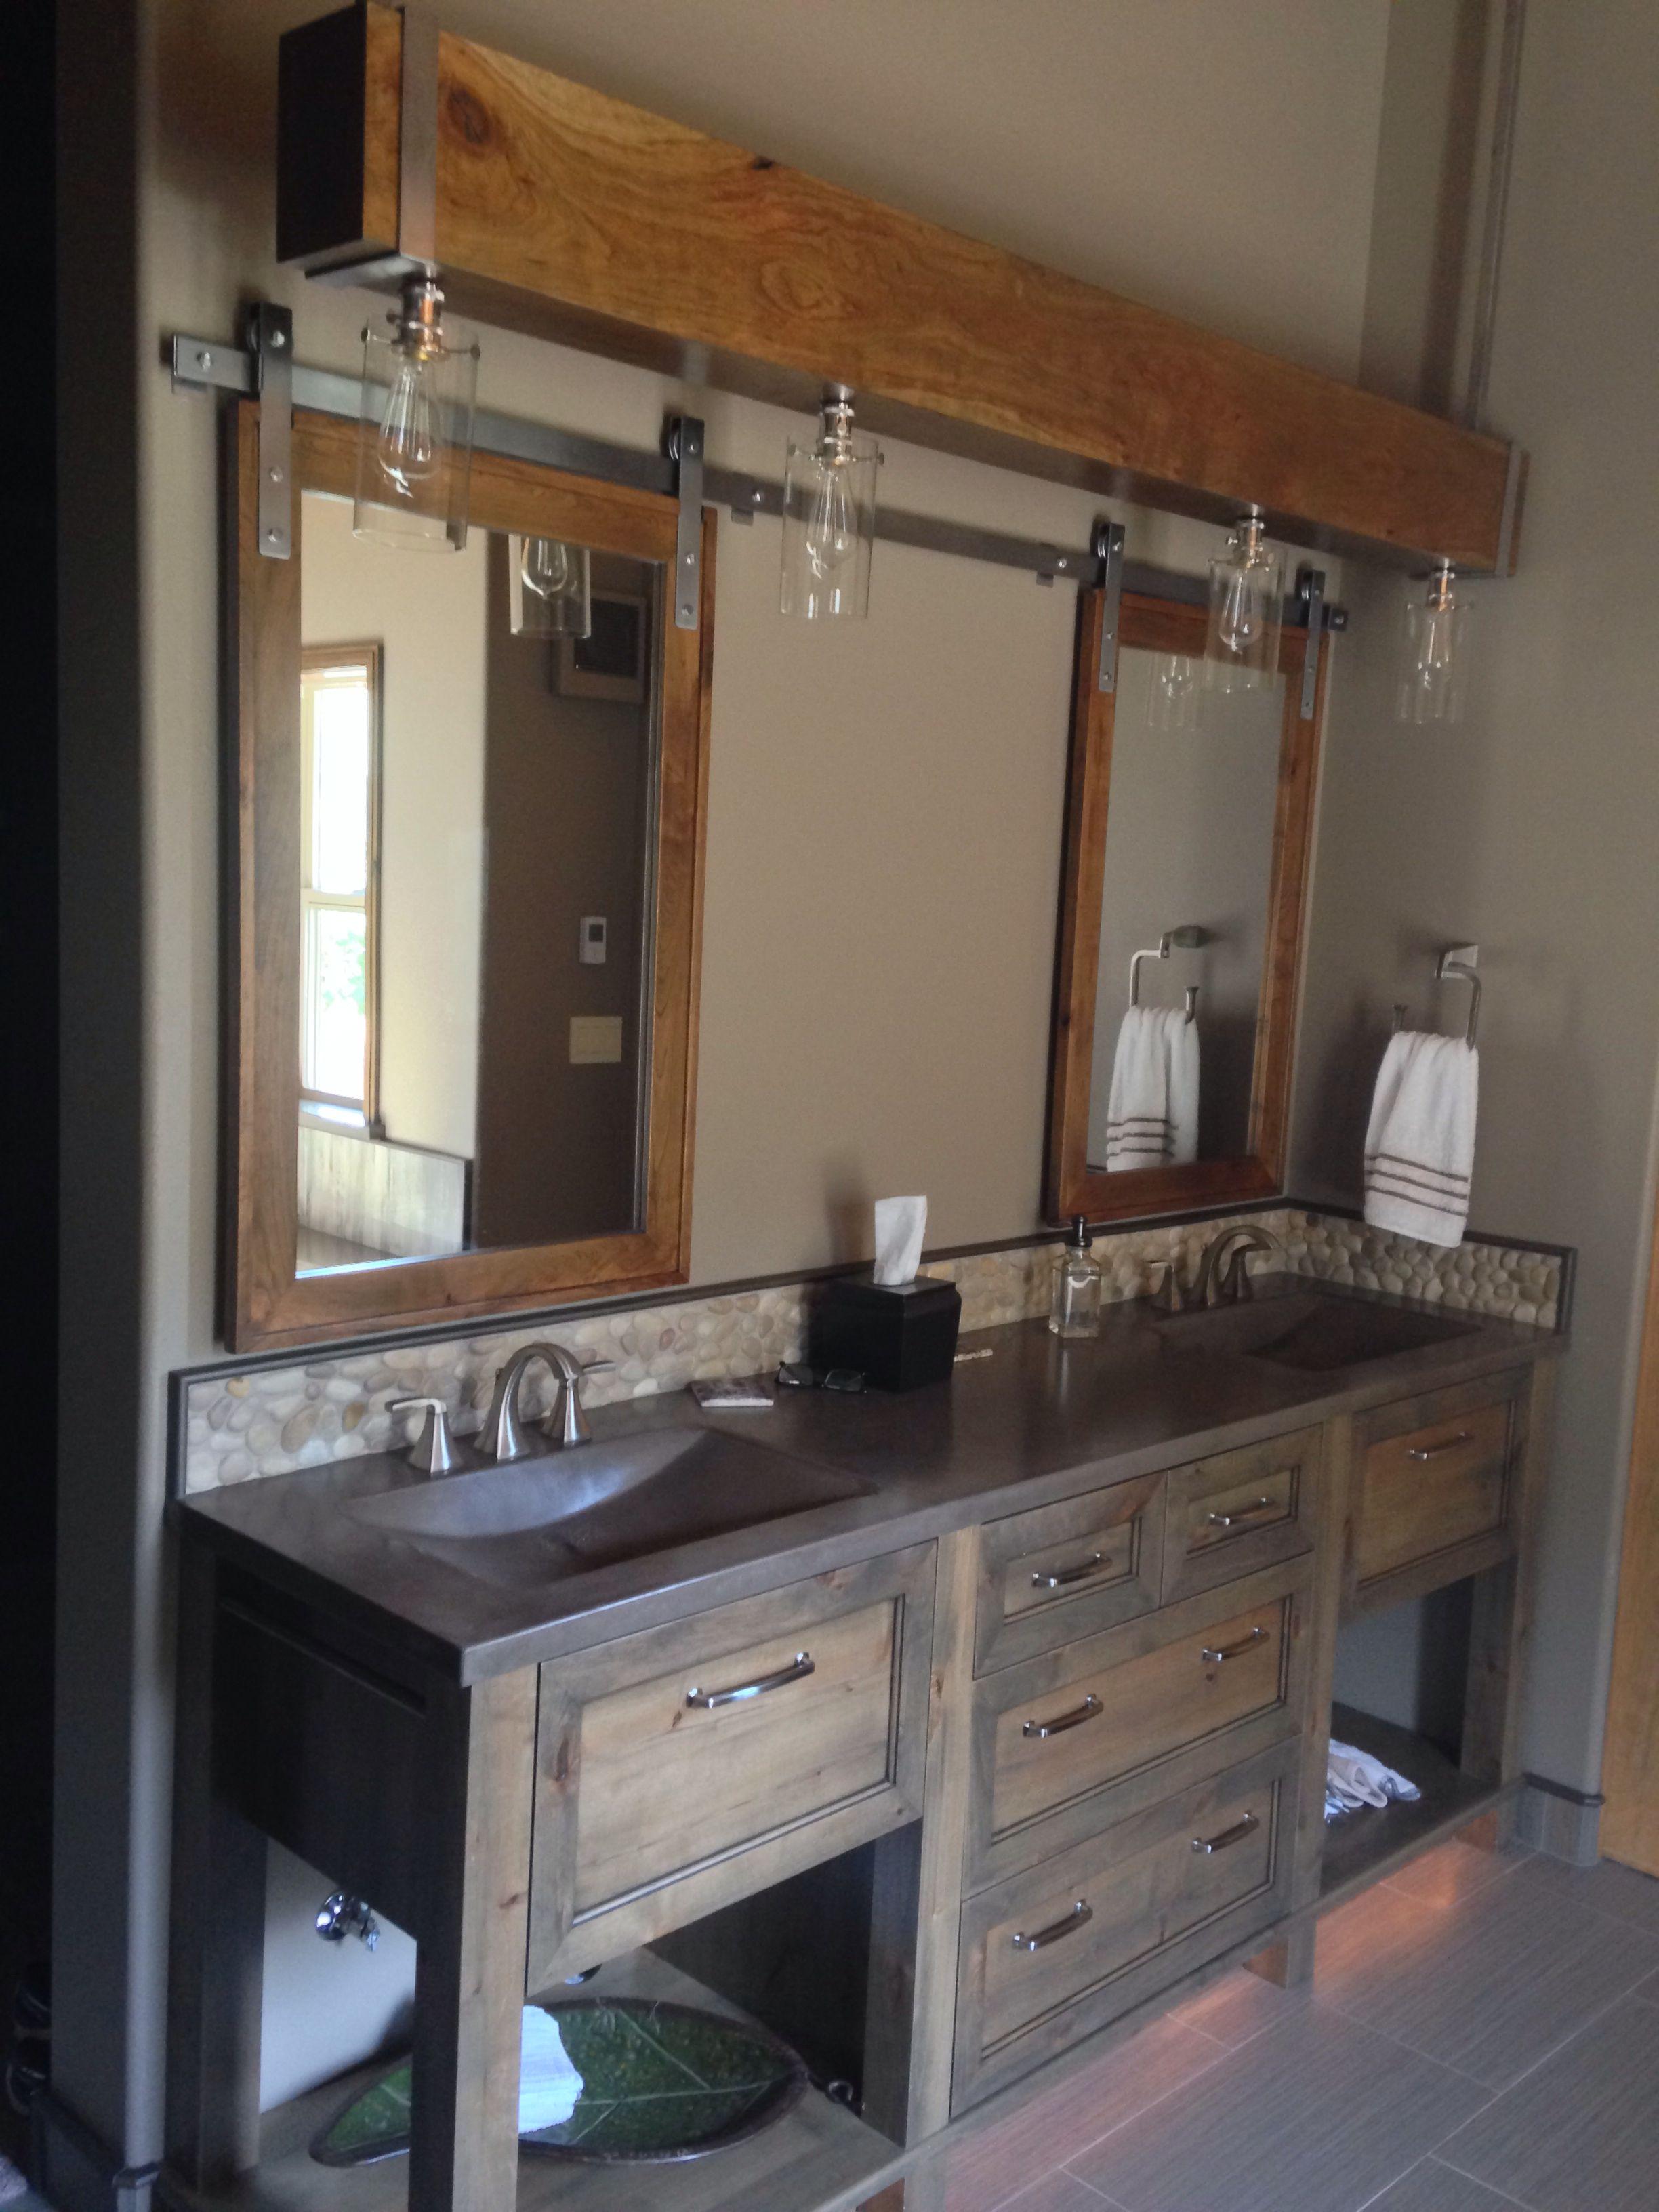 Concrete sinks suspended beam lighting barn door for Suspended bathroom cabinets